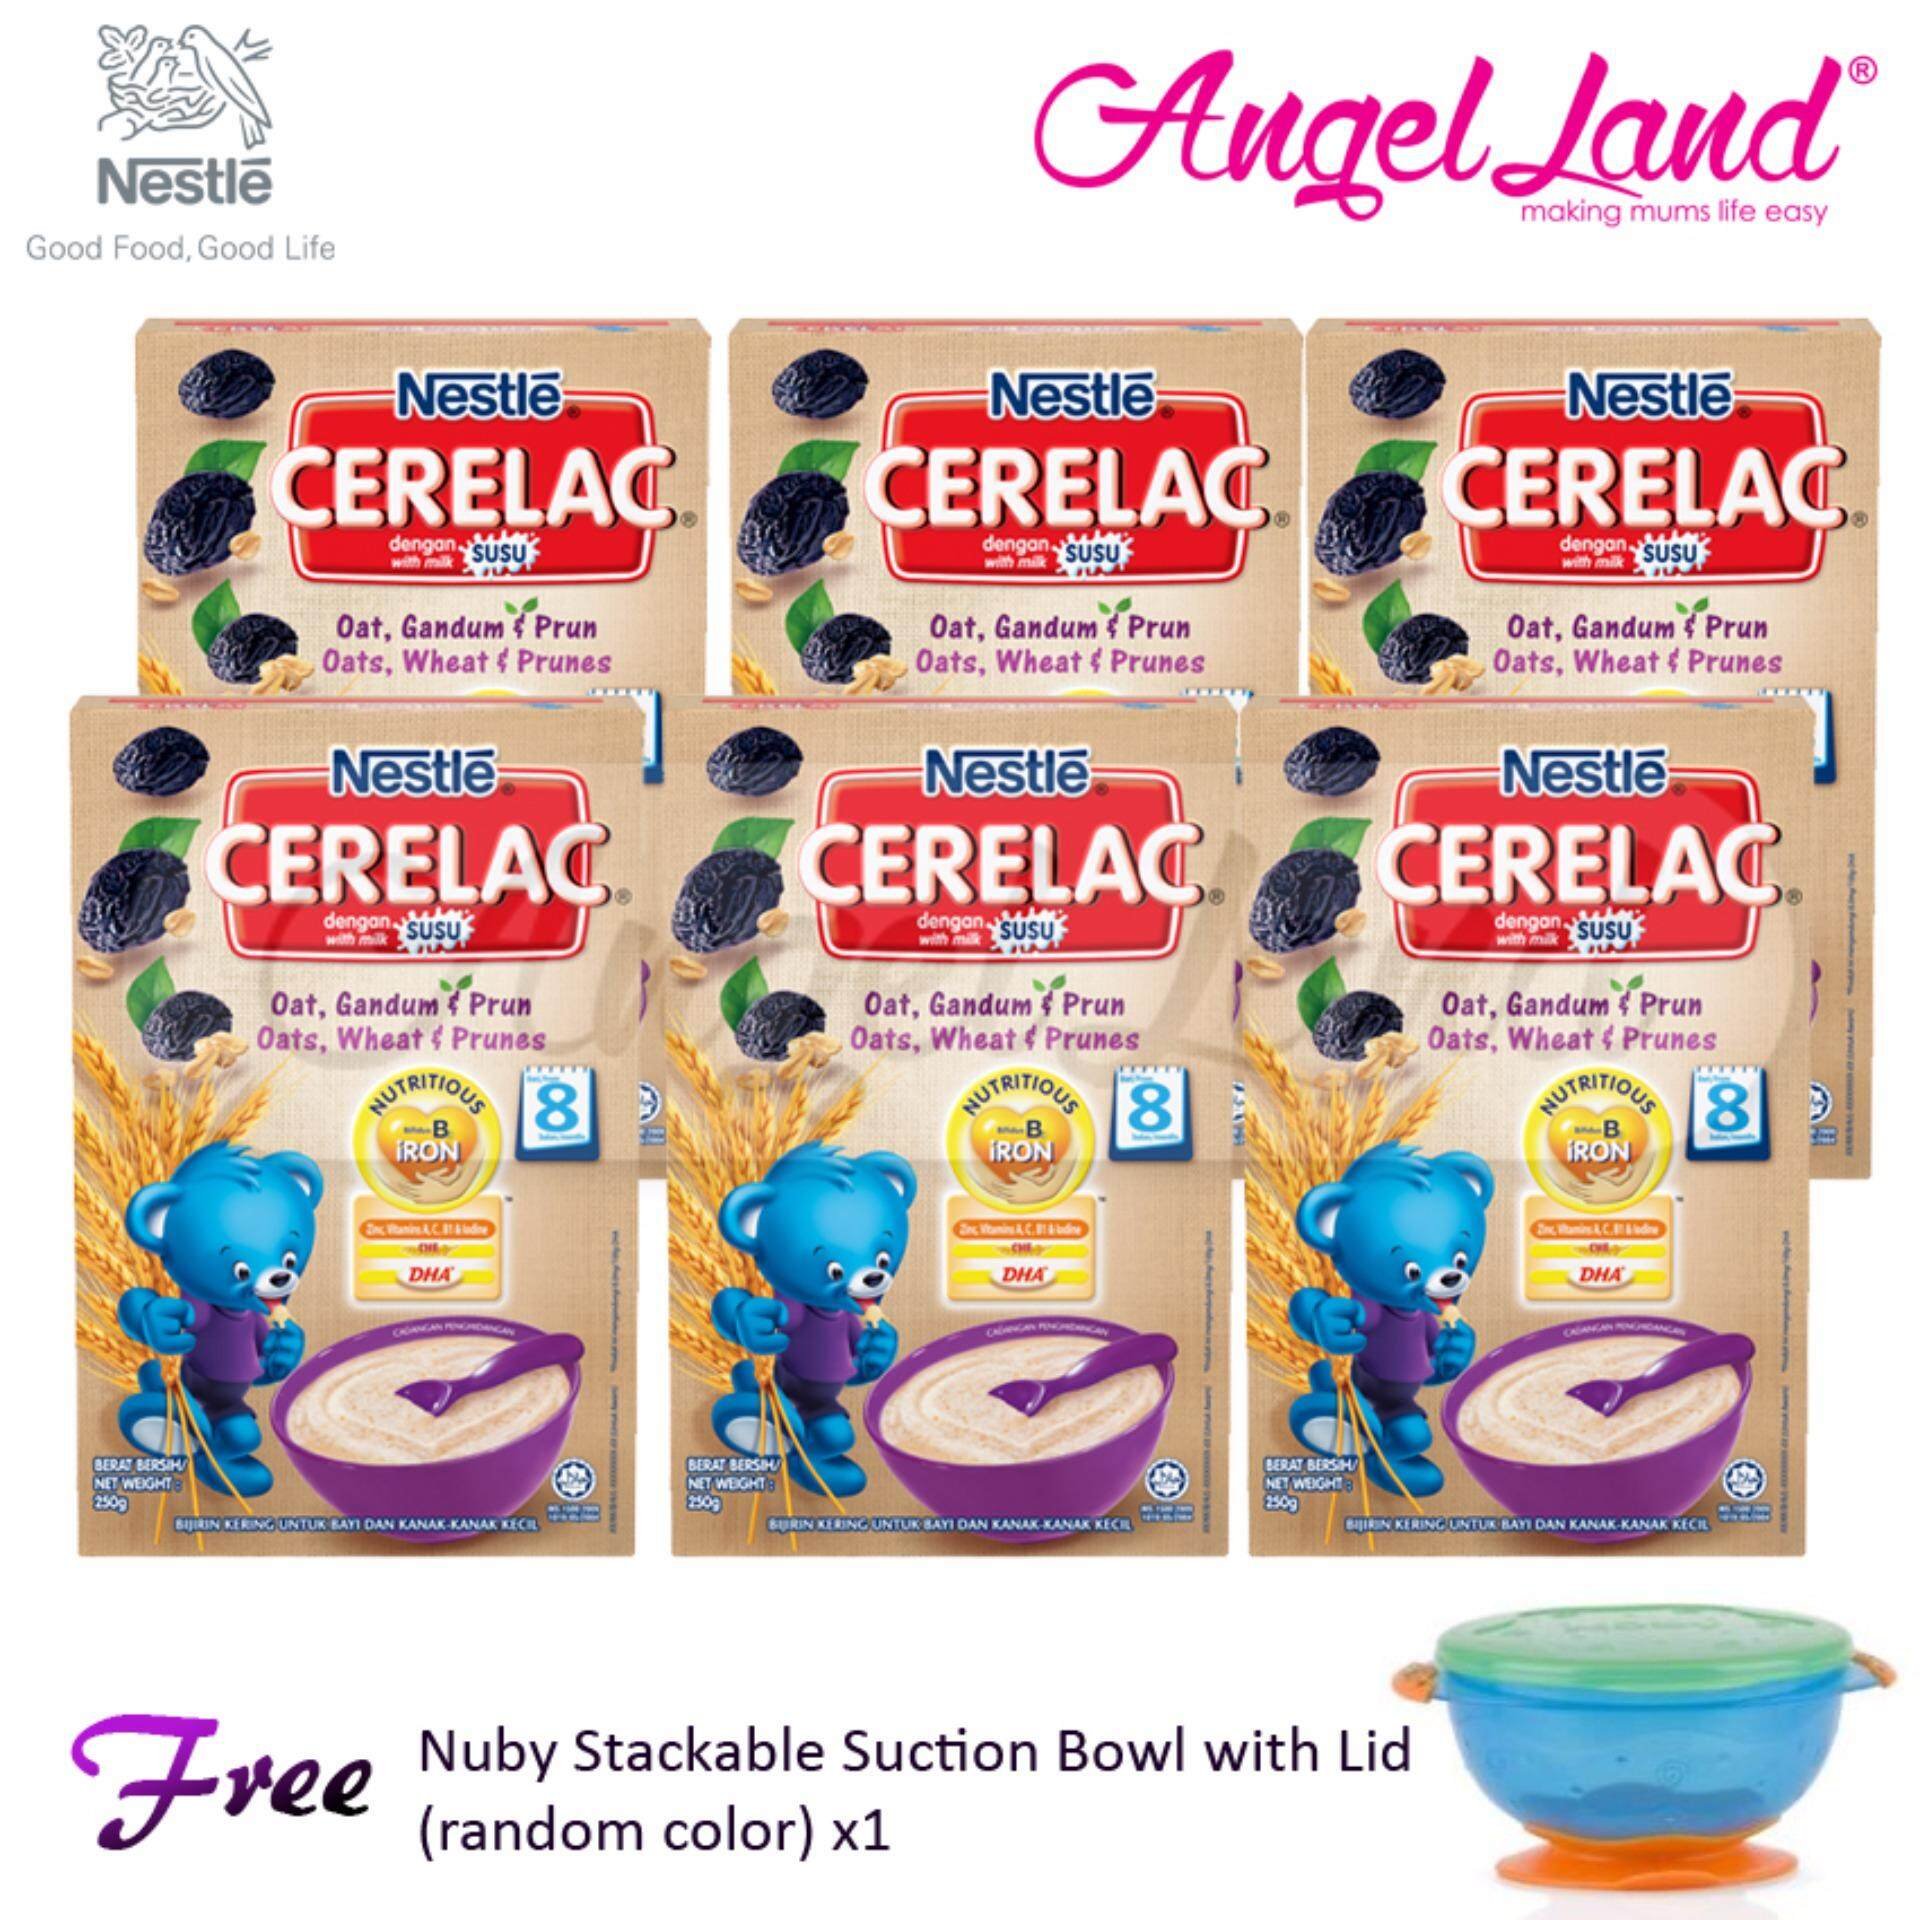 [Buy 6 Cerelac Free Bowl] Cerelac Oats, Wheat & Prunes 8m+ (250g) x6 + FOC 1 Nuby Stackable Suction Bowl (random)